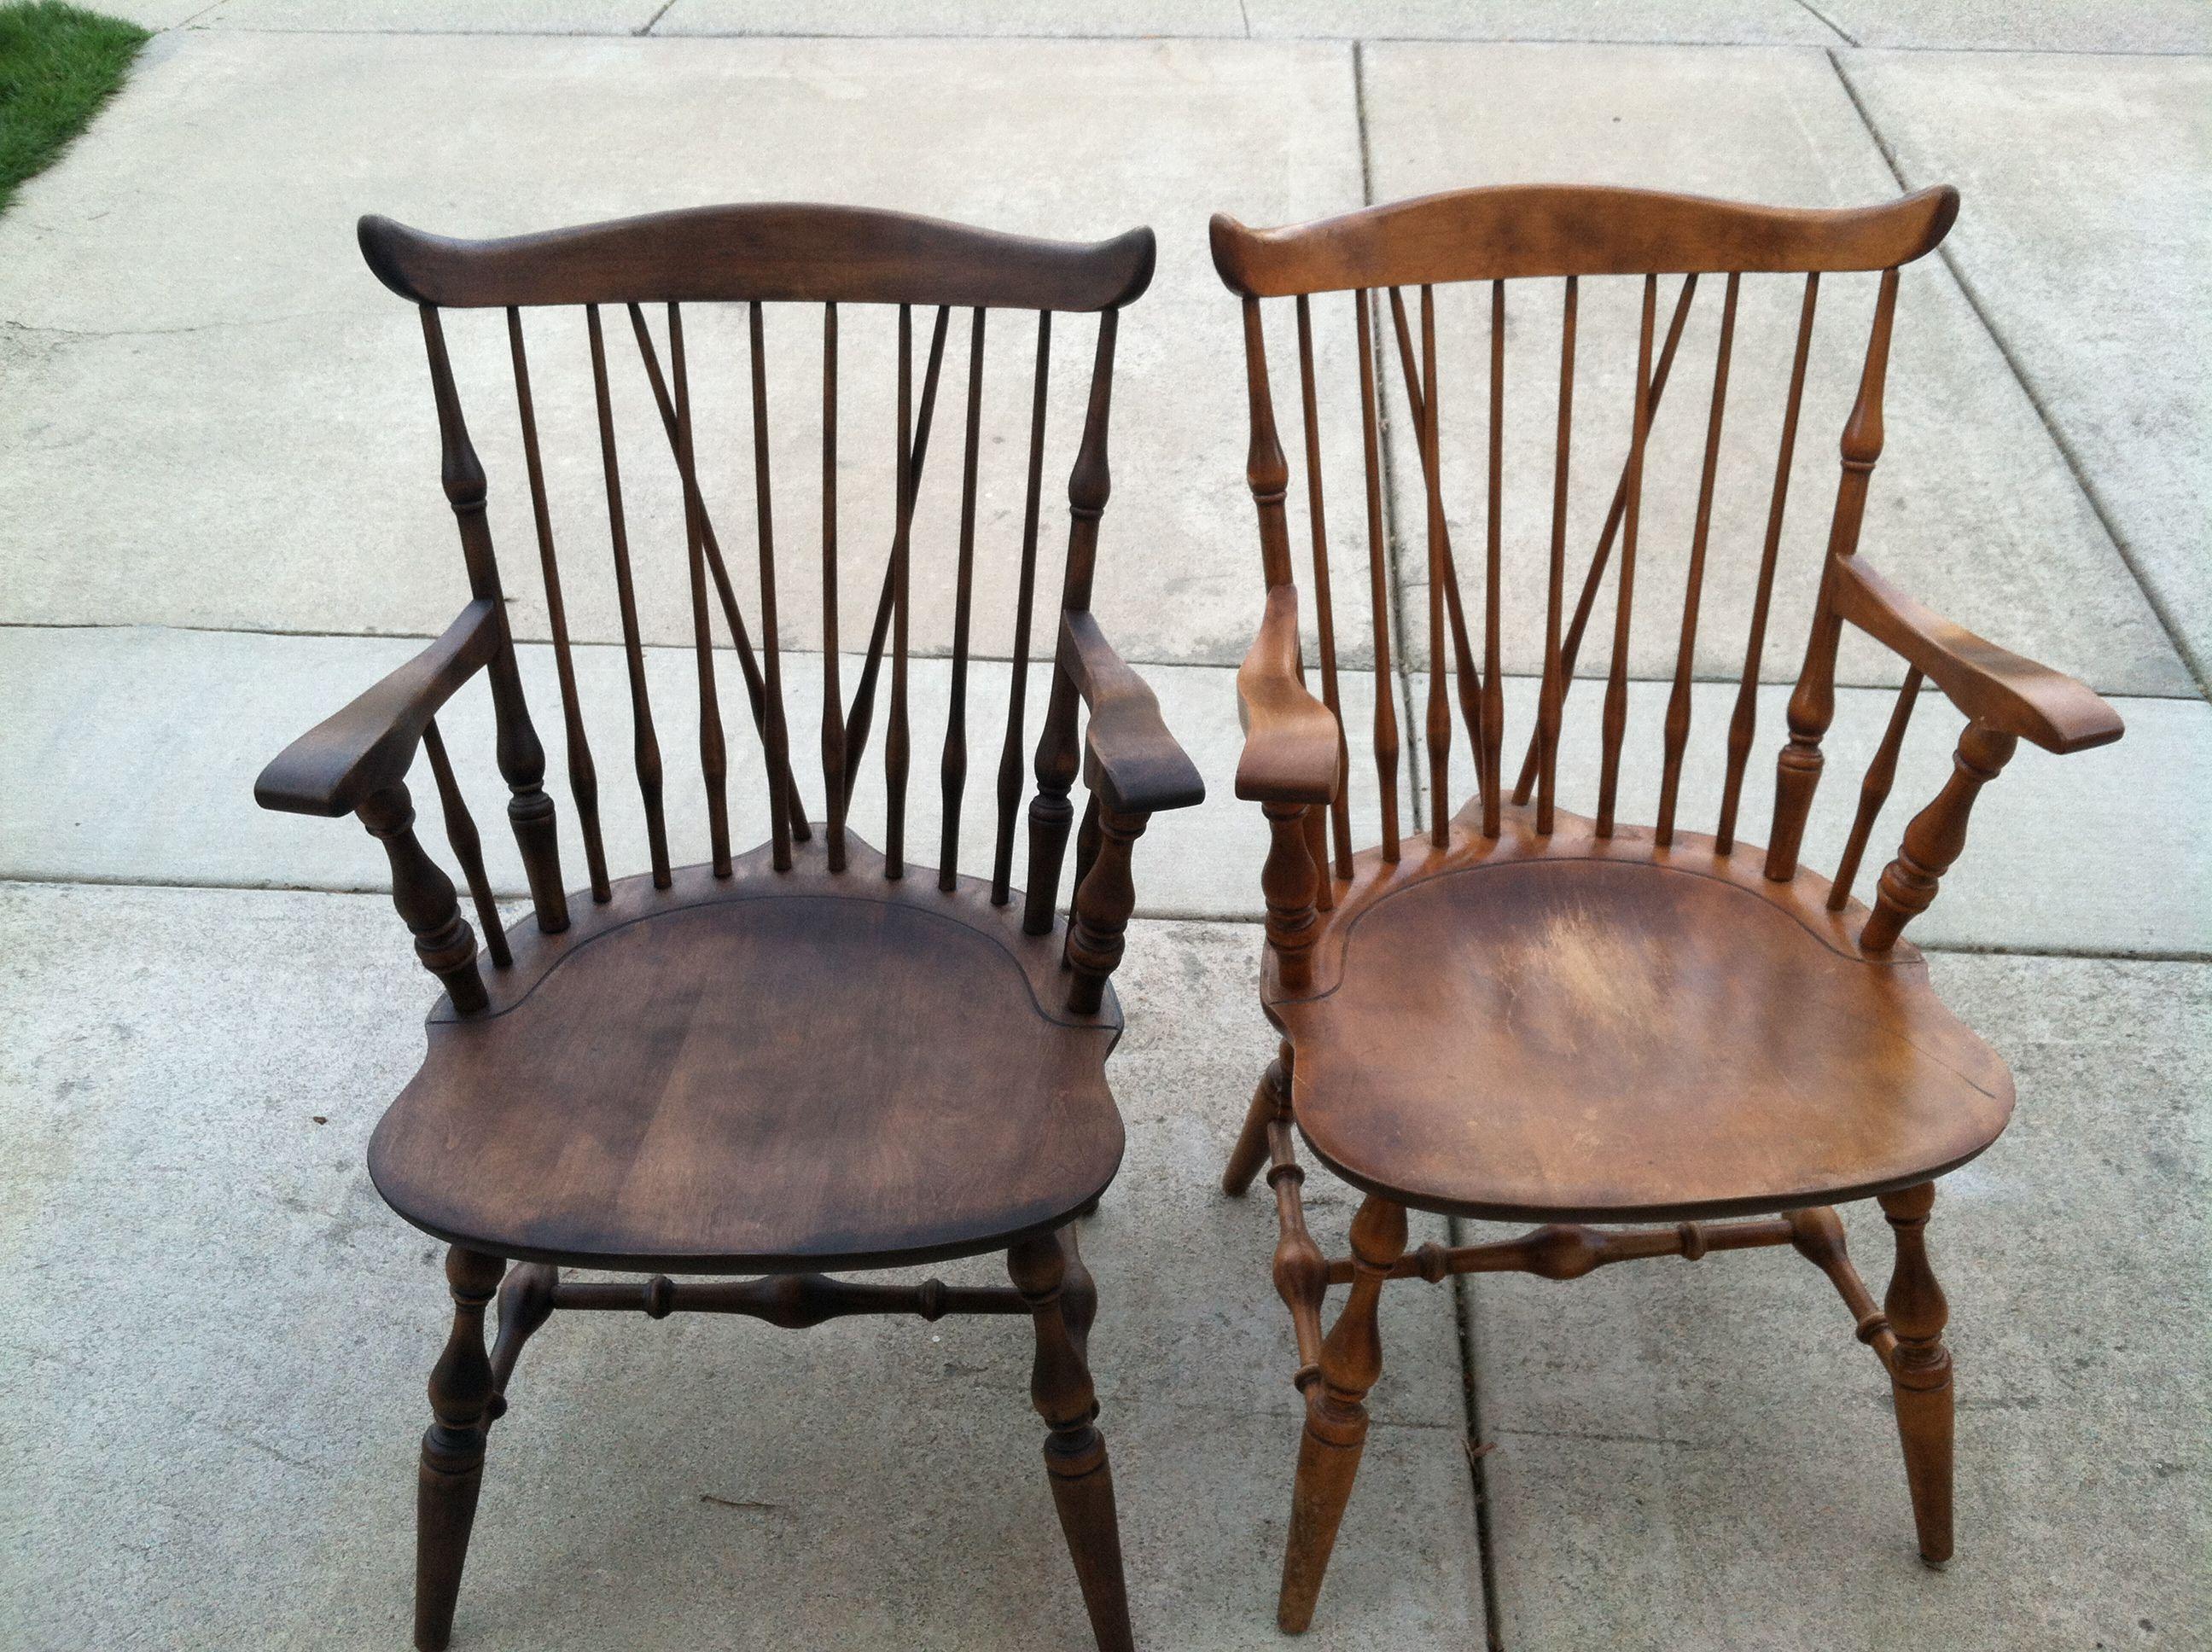 Nichols & Stone chair Chair, Rocking chair, Dining chairs